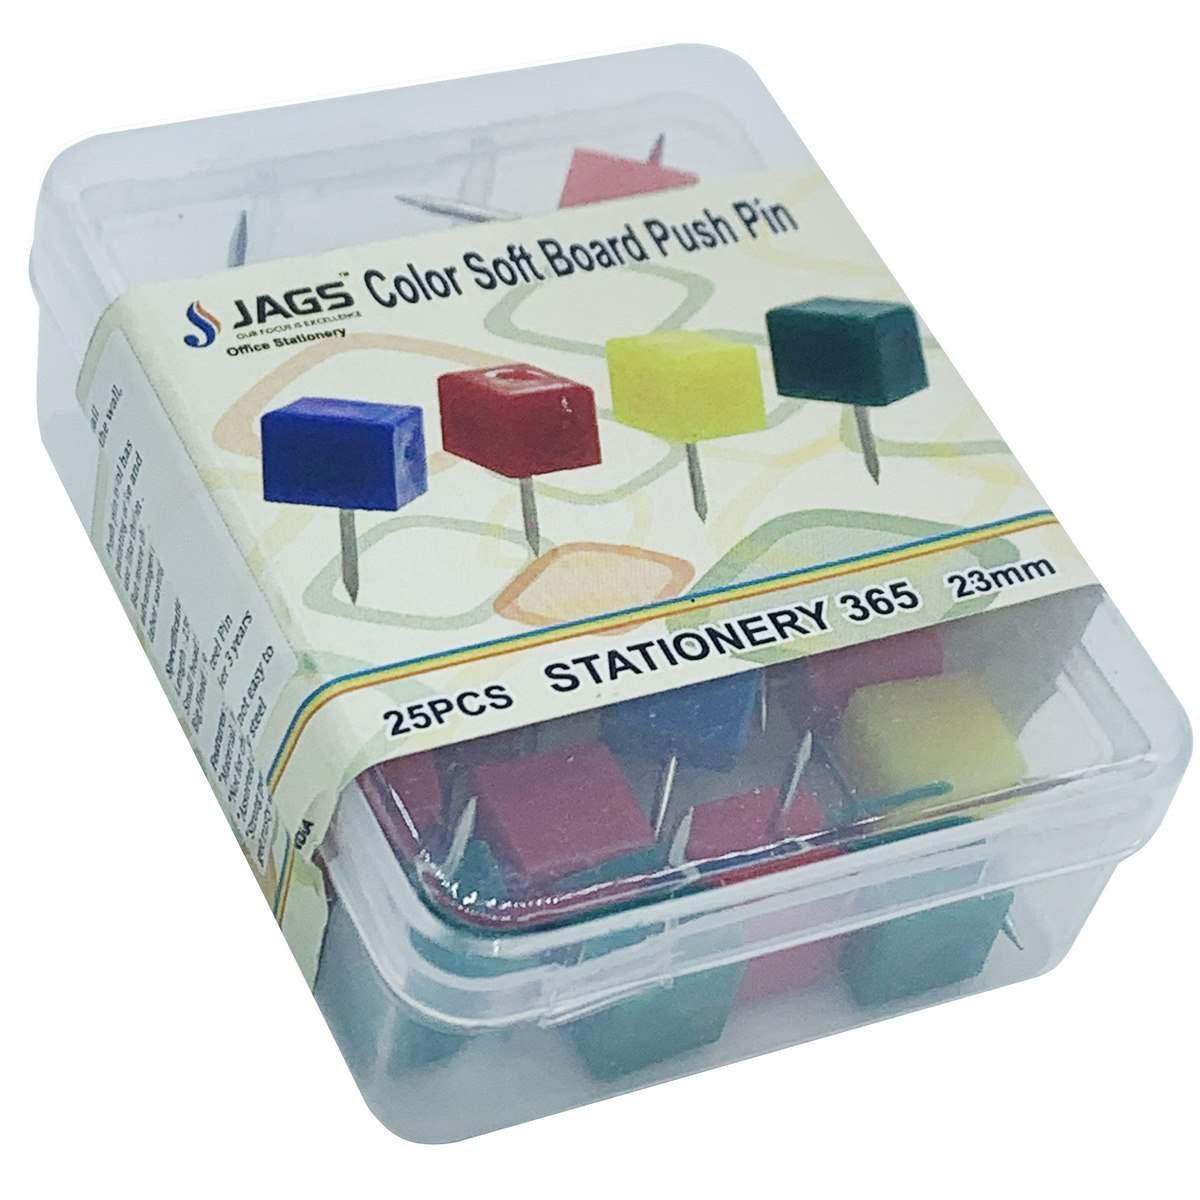 Soft Board Push Pin Square Shape